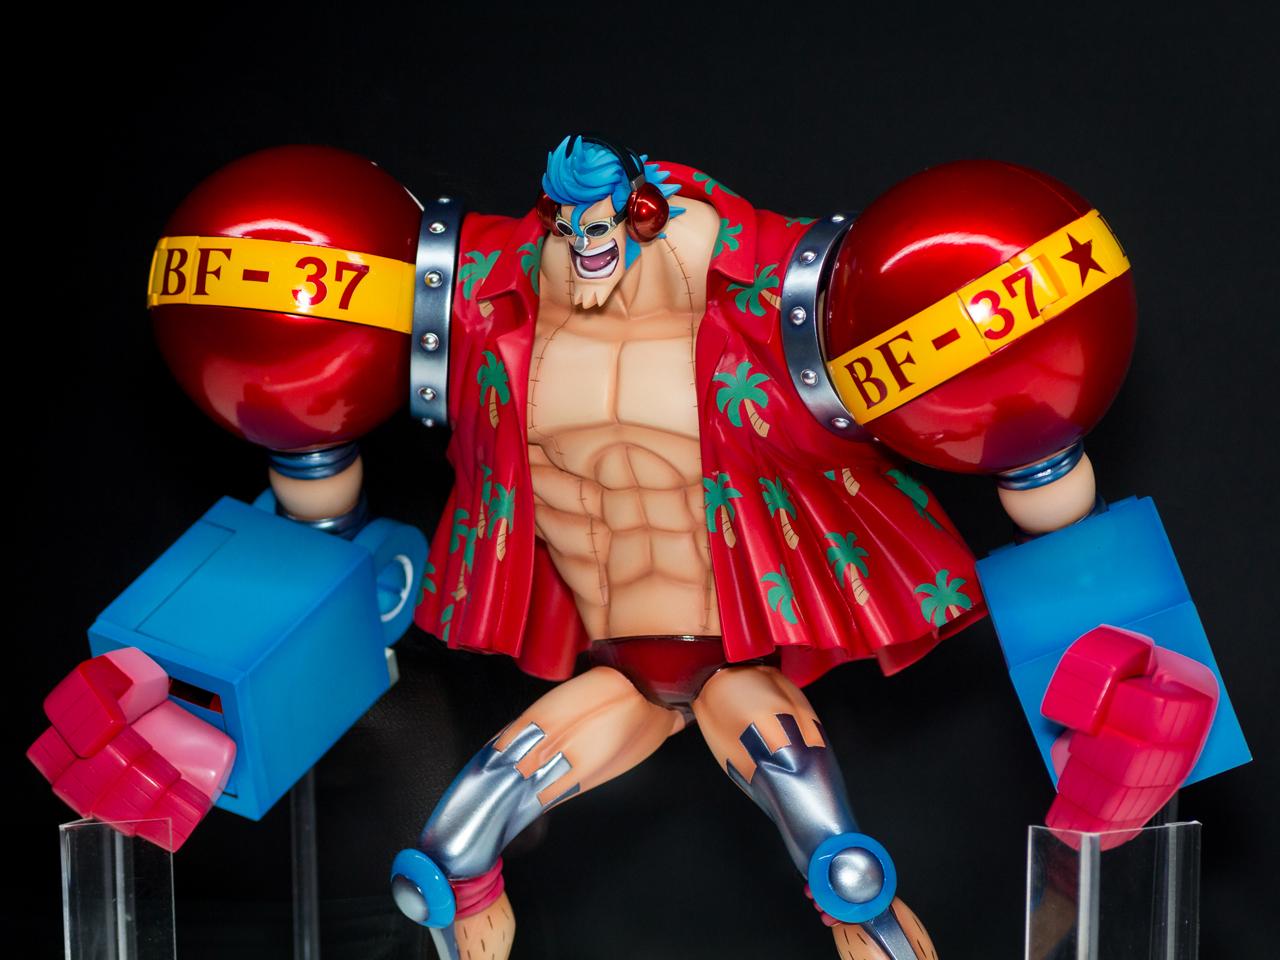 Franky One Piece 5 Background Wallpaper Animewp Com